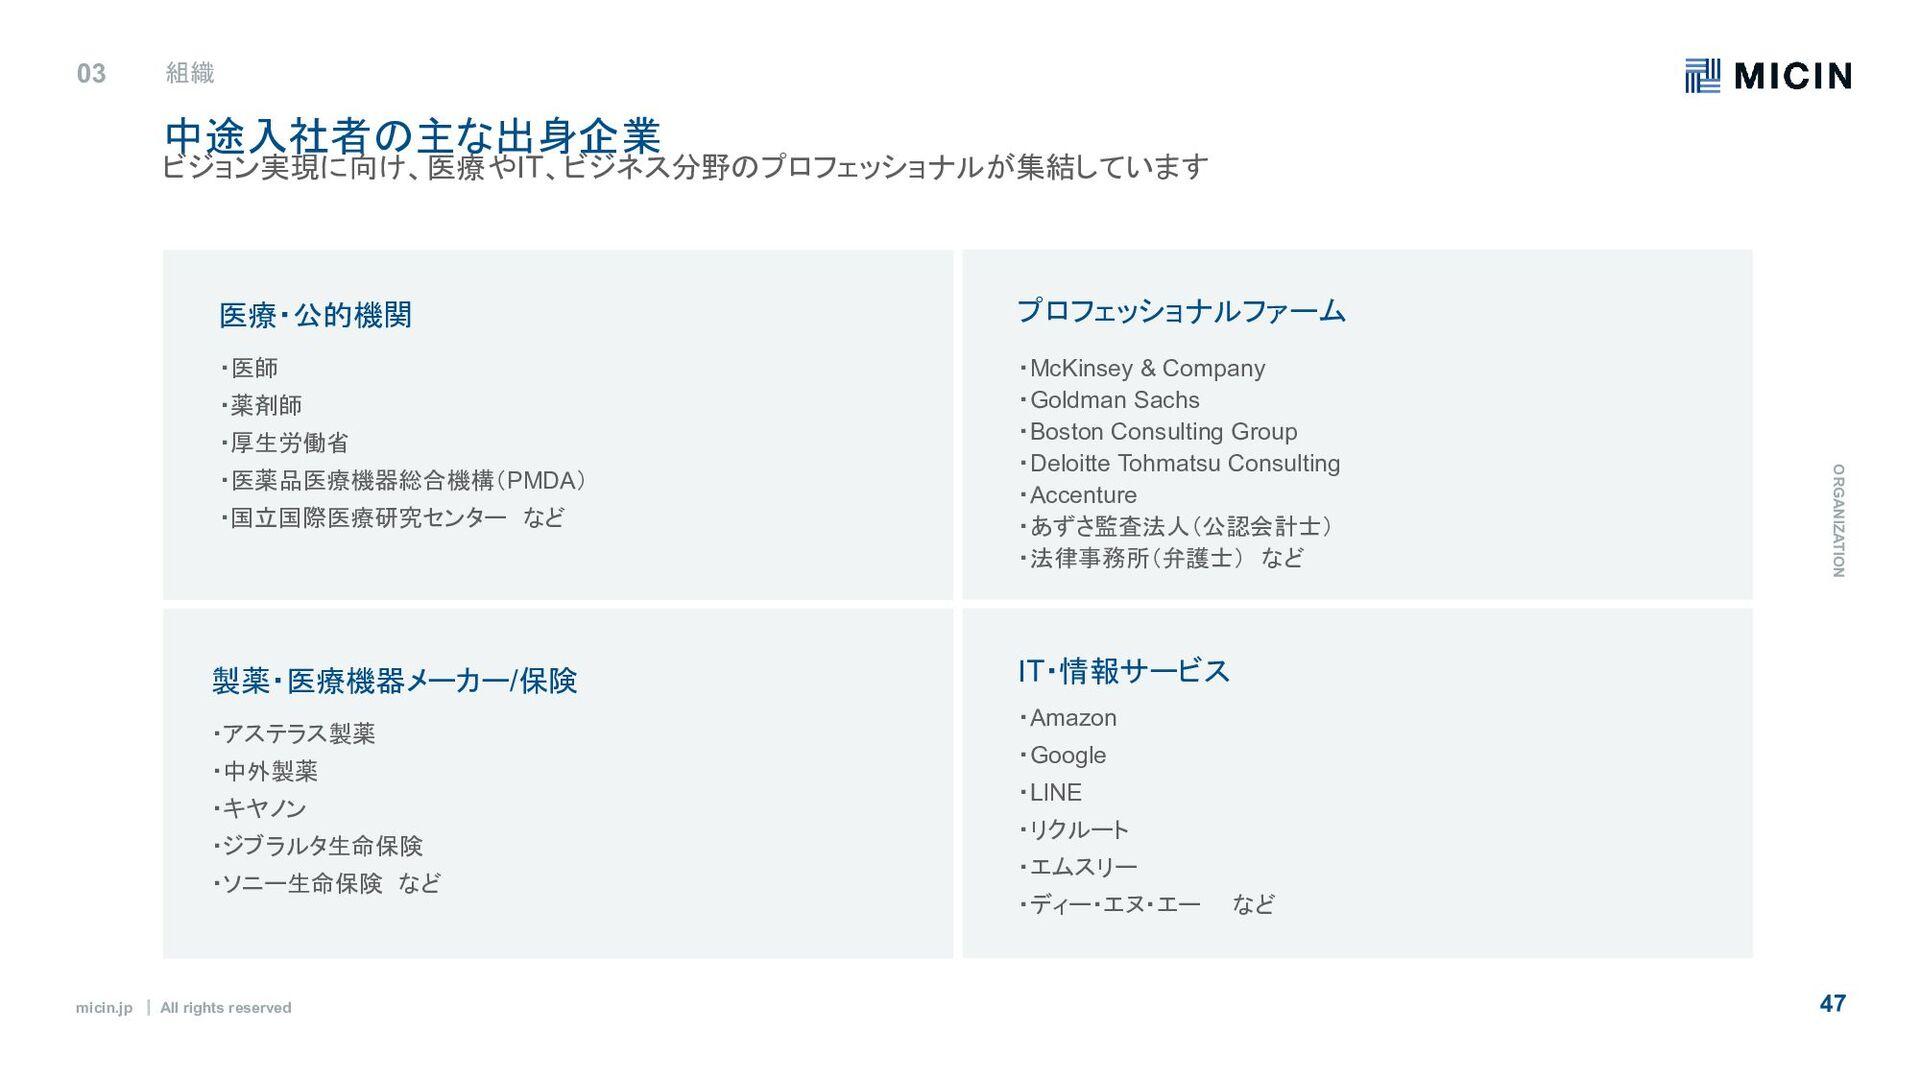 micin.jp ʛ All rights reserved 47 メンバー紹介 03 O R...